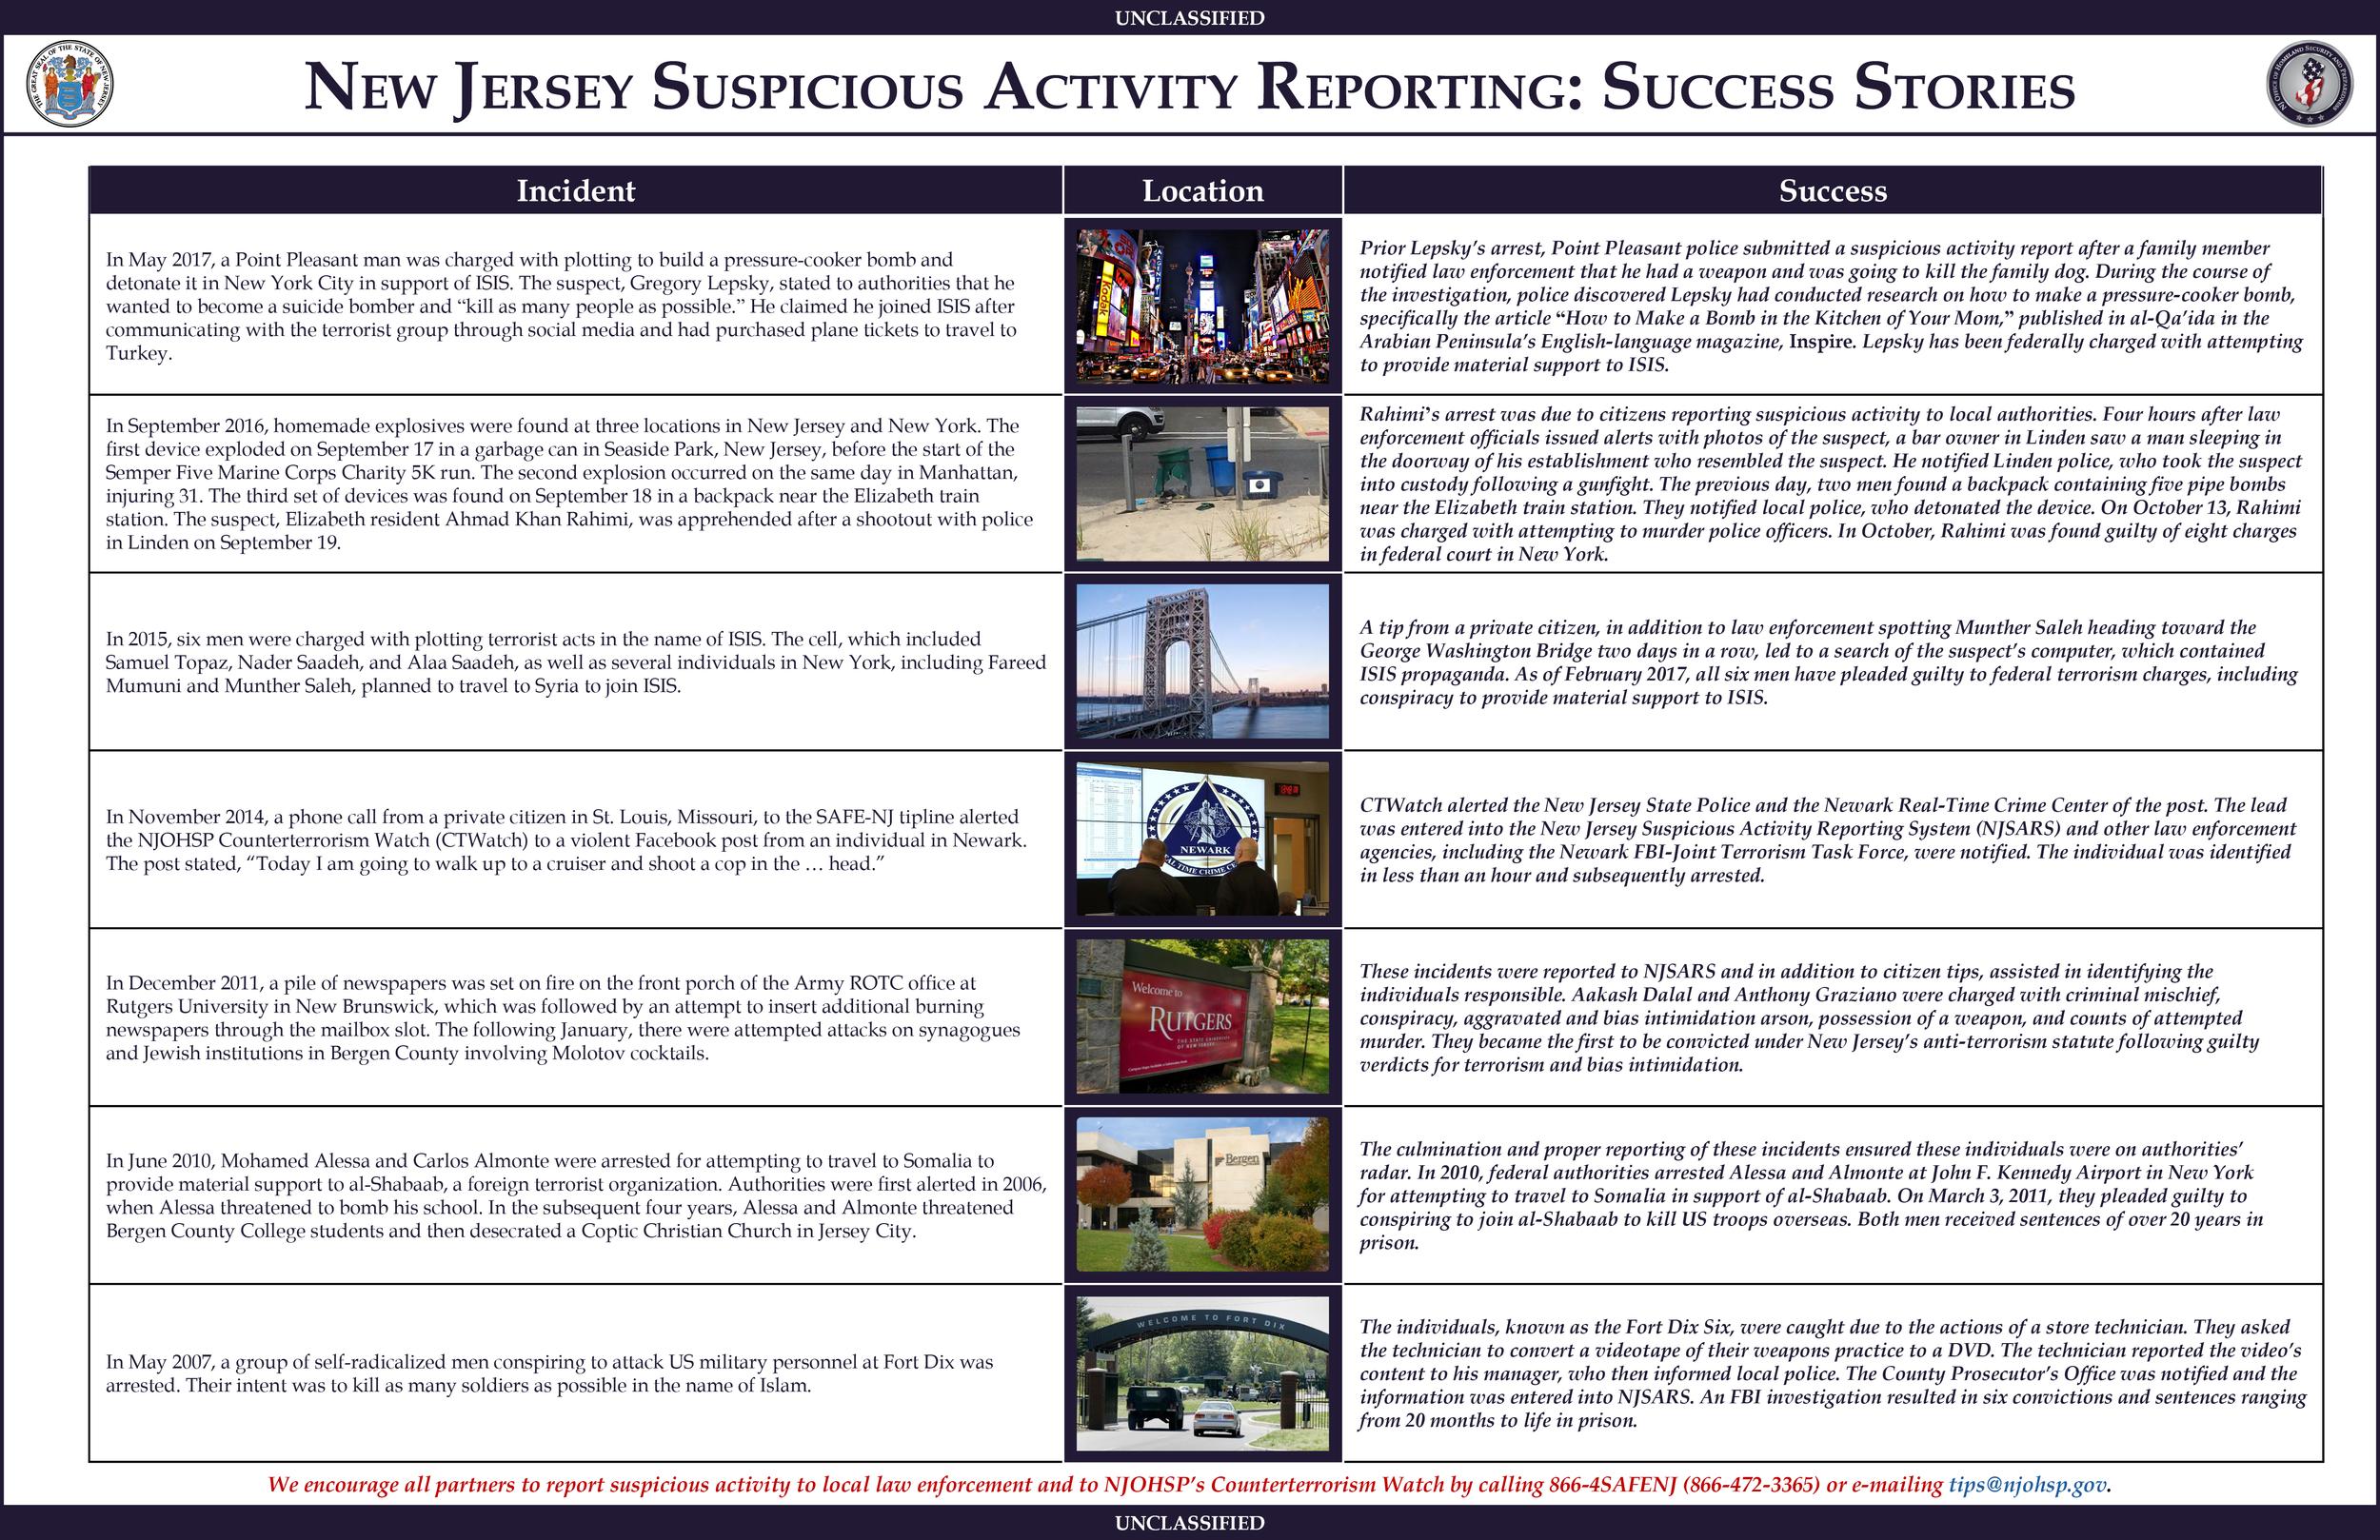 NJSAR Success Stories (11.14.17).png